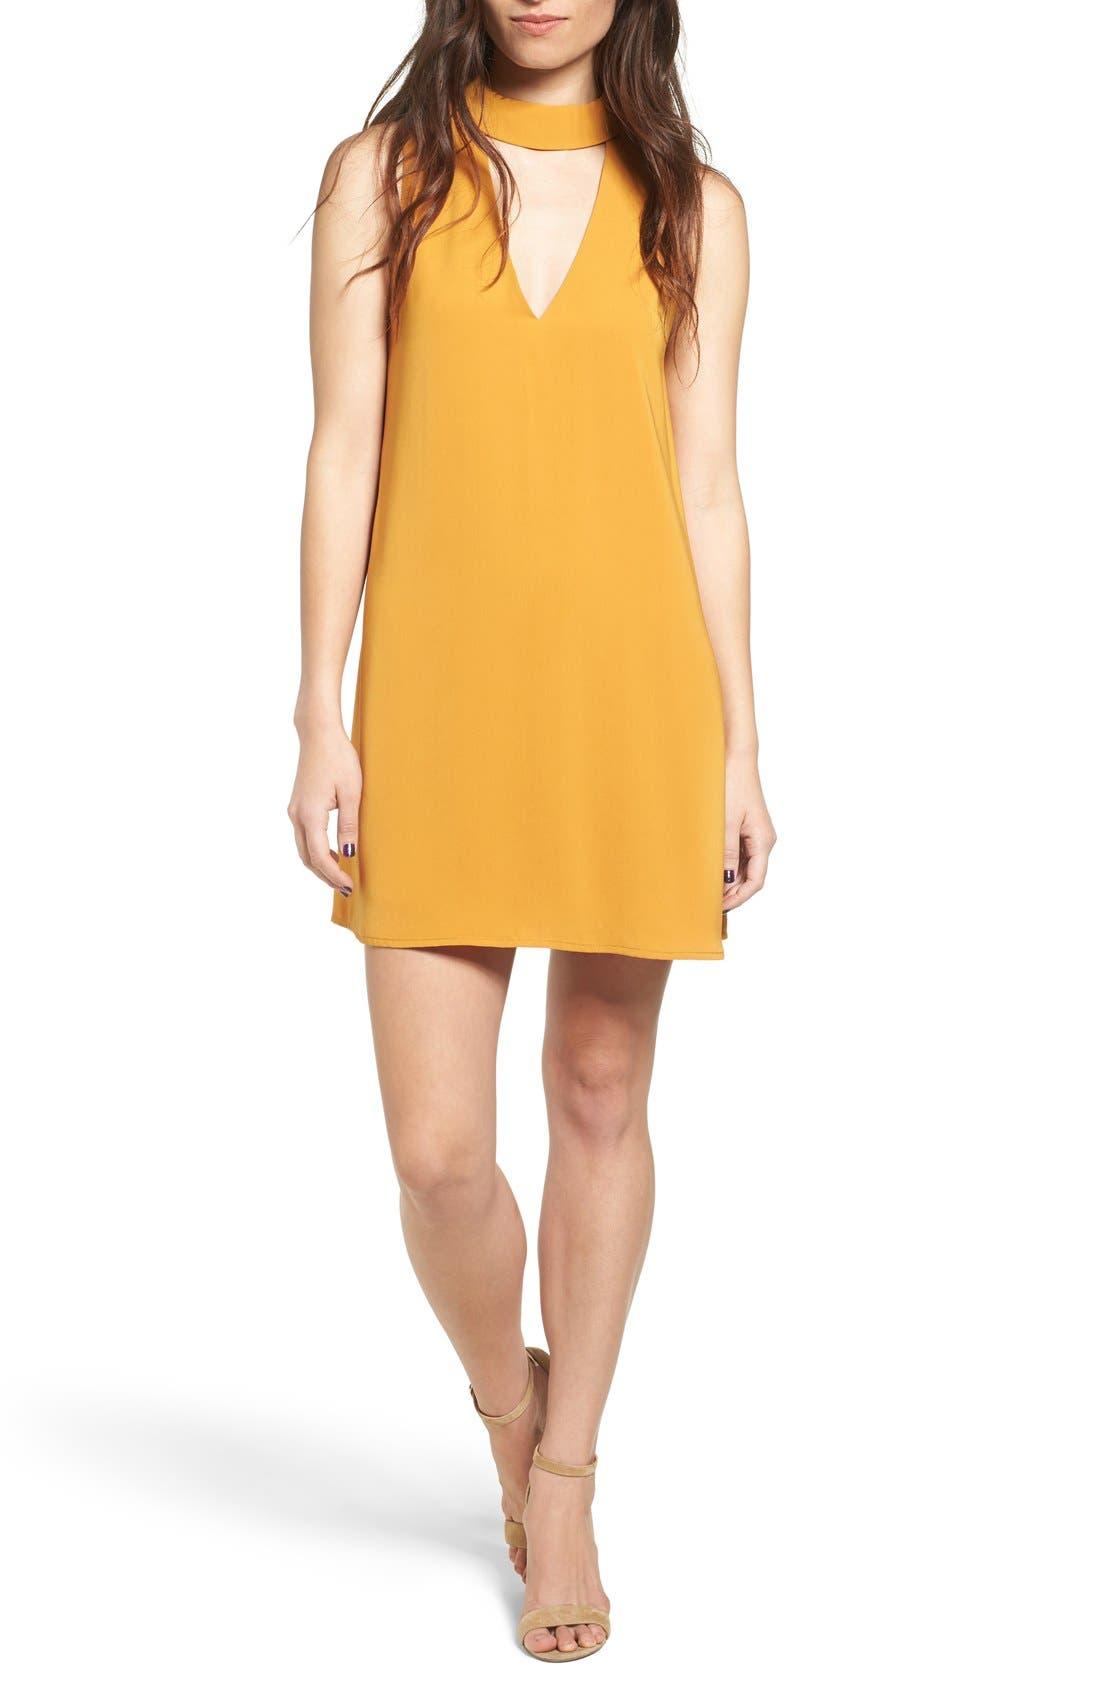 Alternate Image 1 Selected - Cream and Sugar Cutout Front Mock Neck Shift Dress